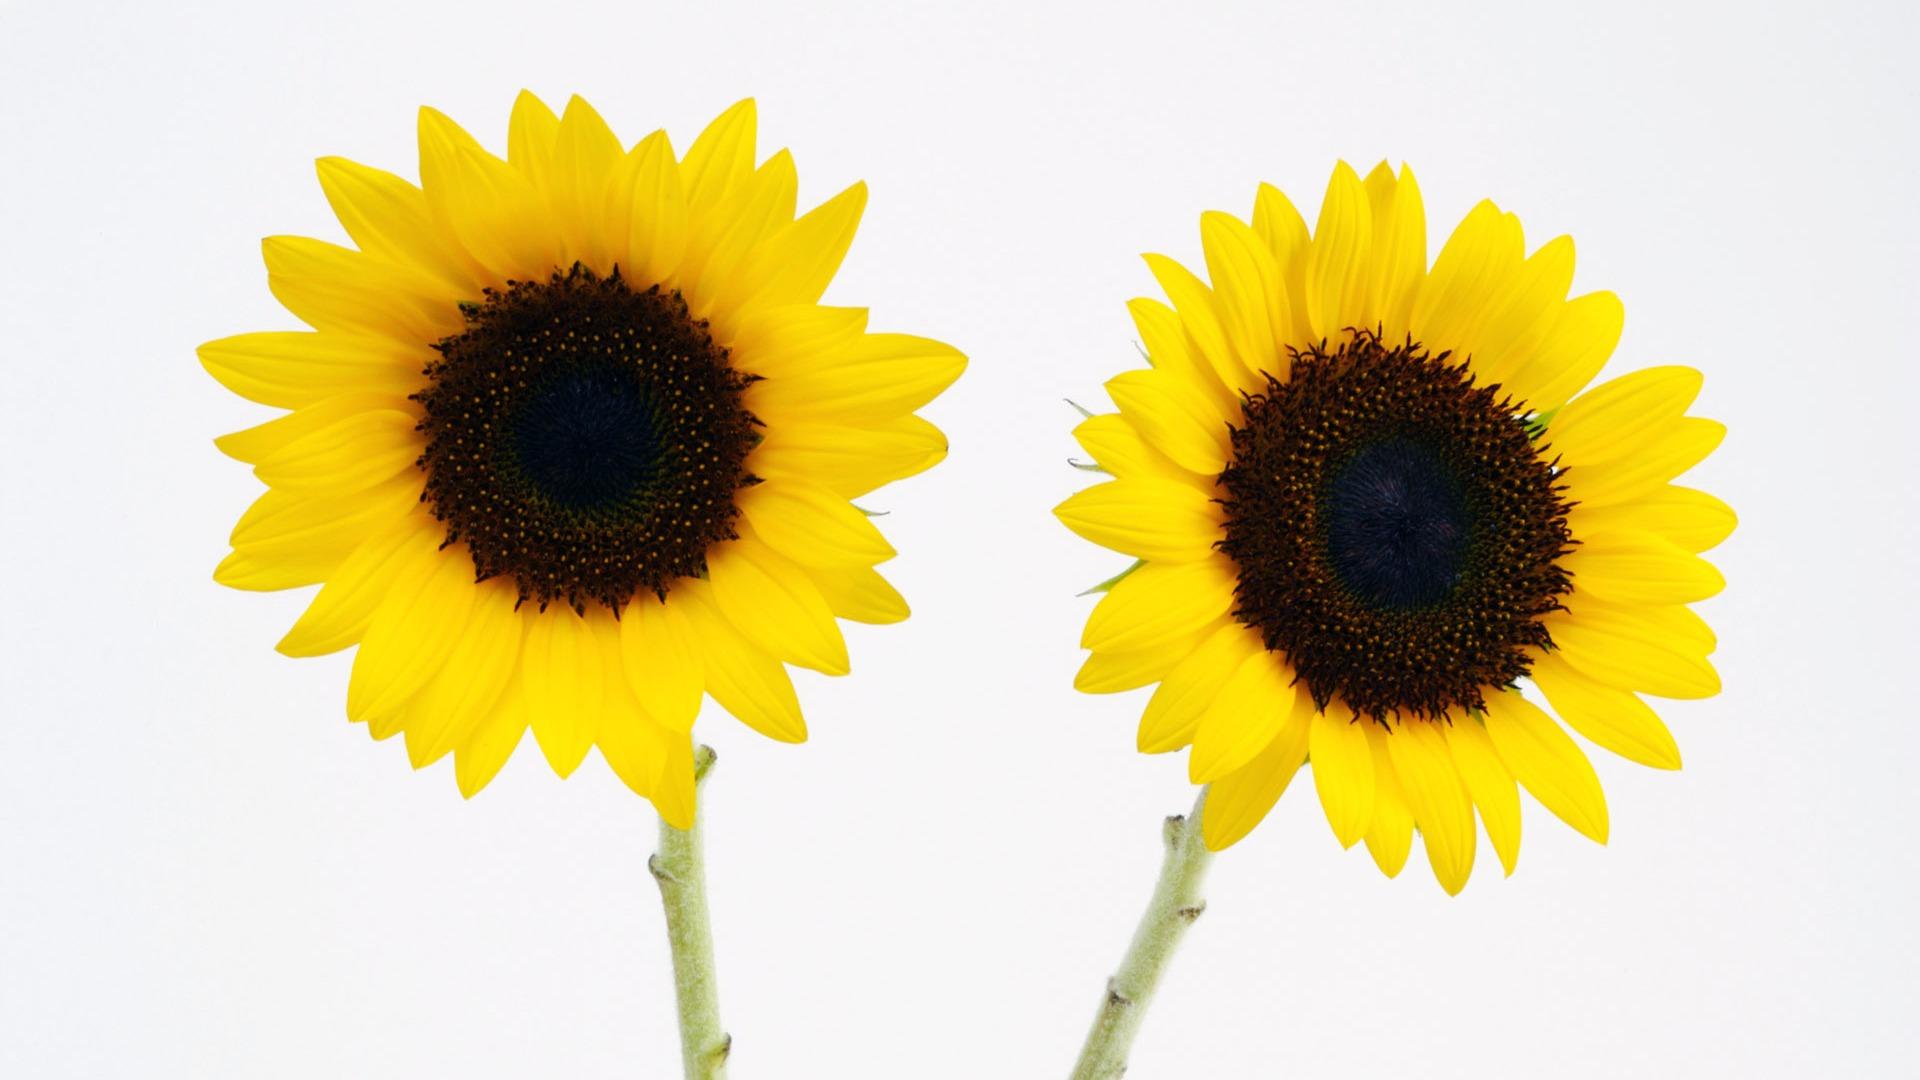 sunflower 8 wallpaper 1920x1080 - photo #41